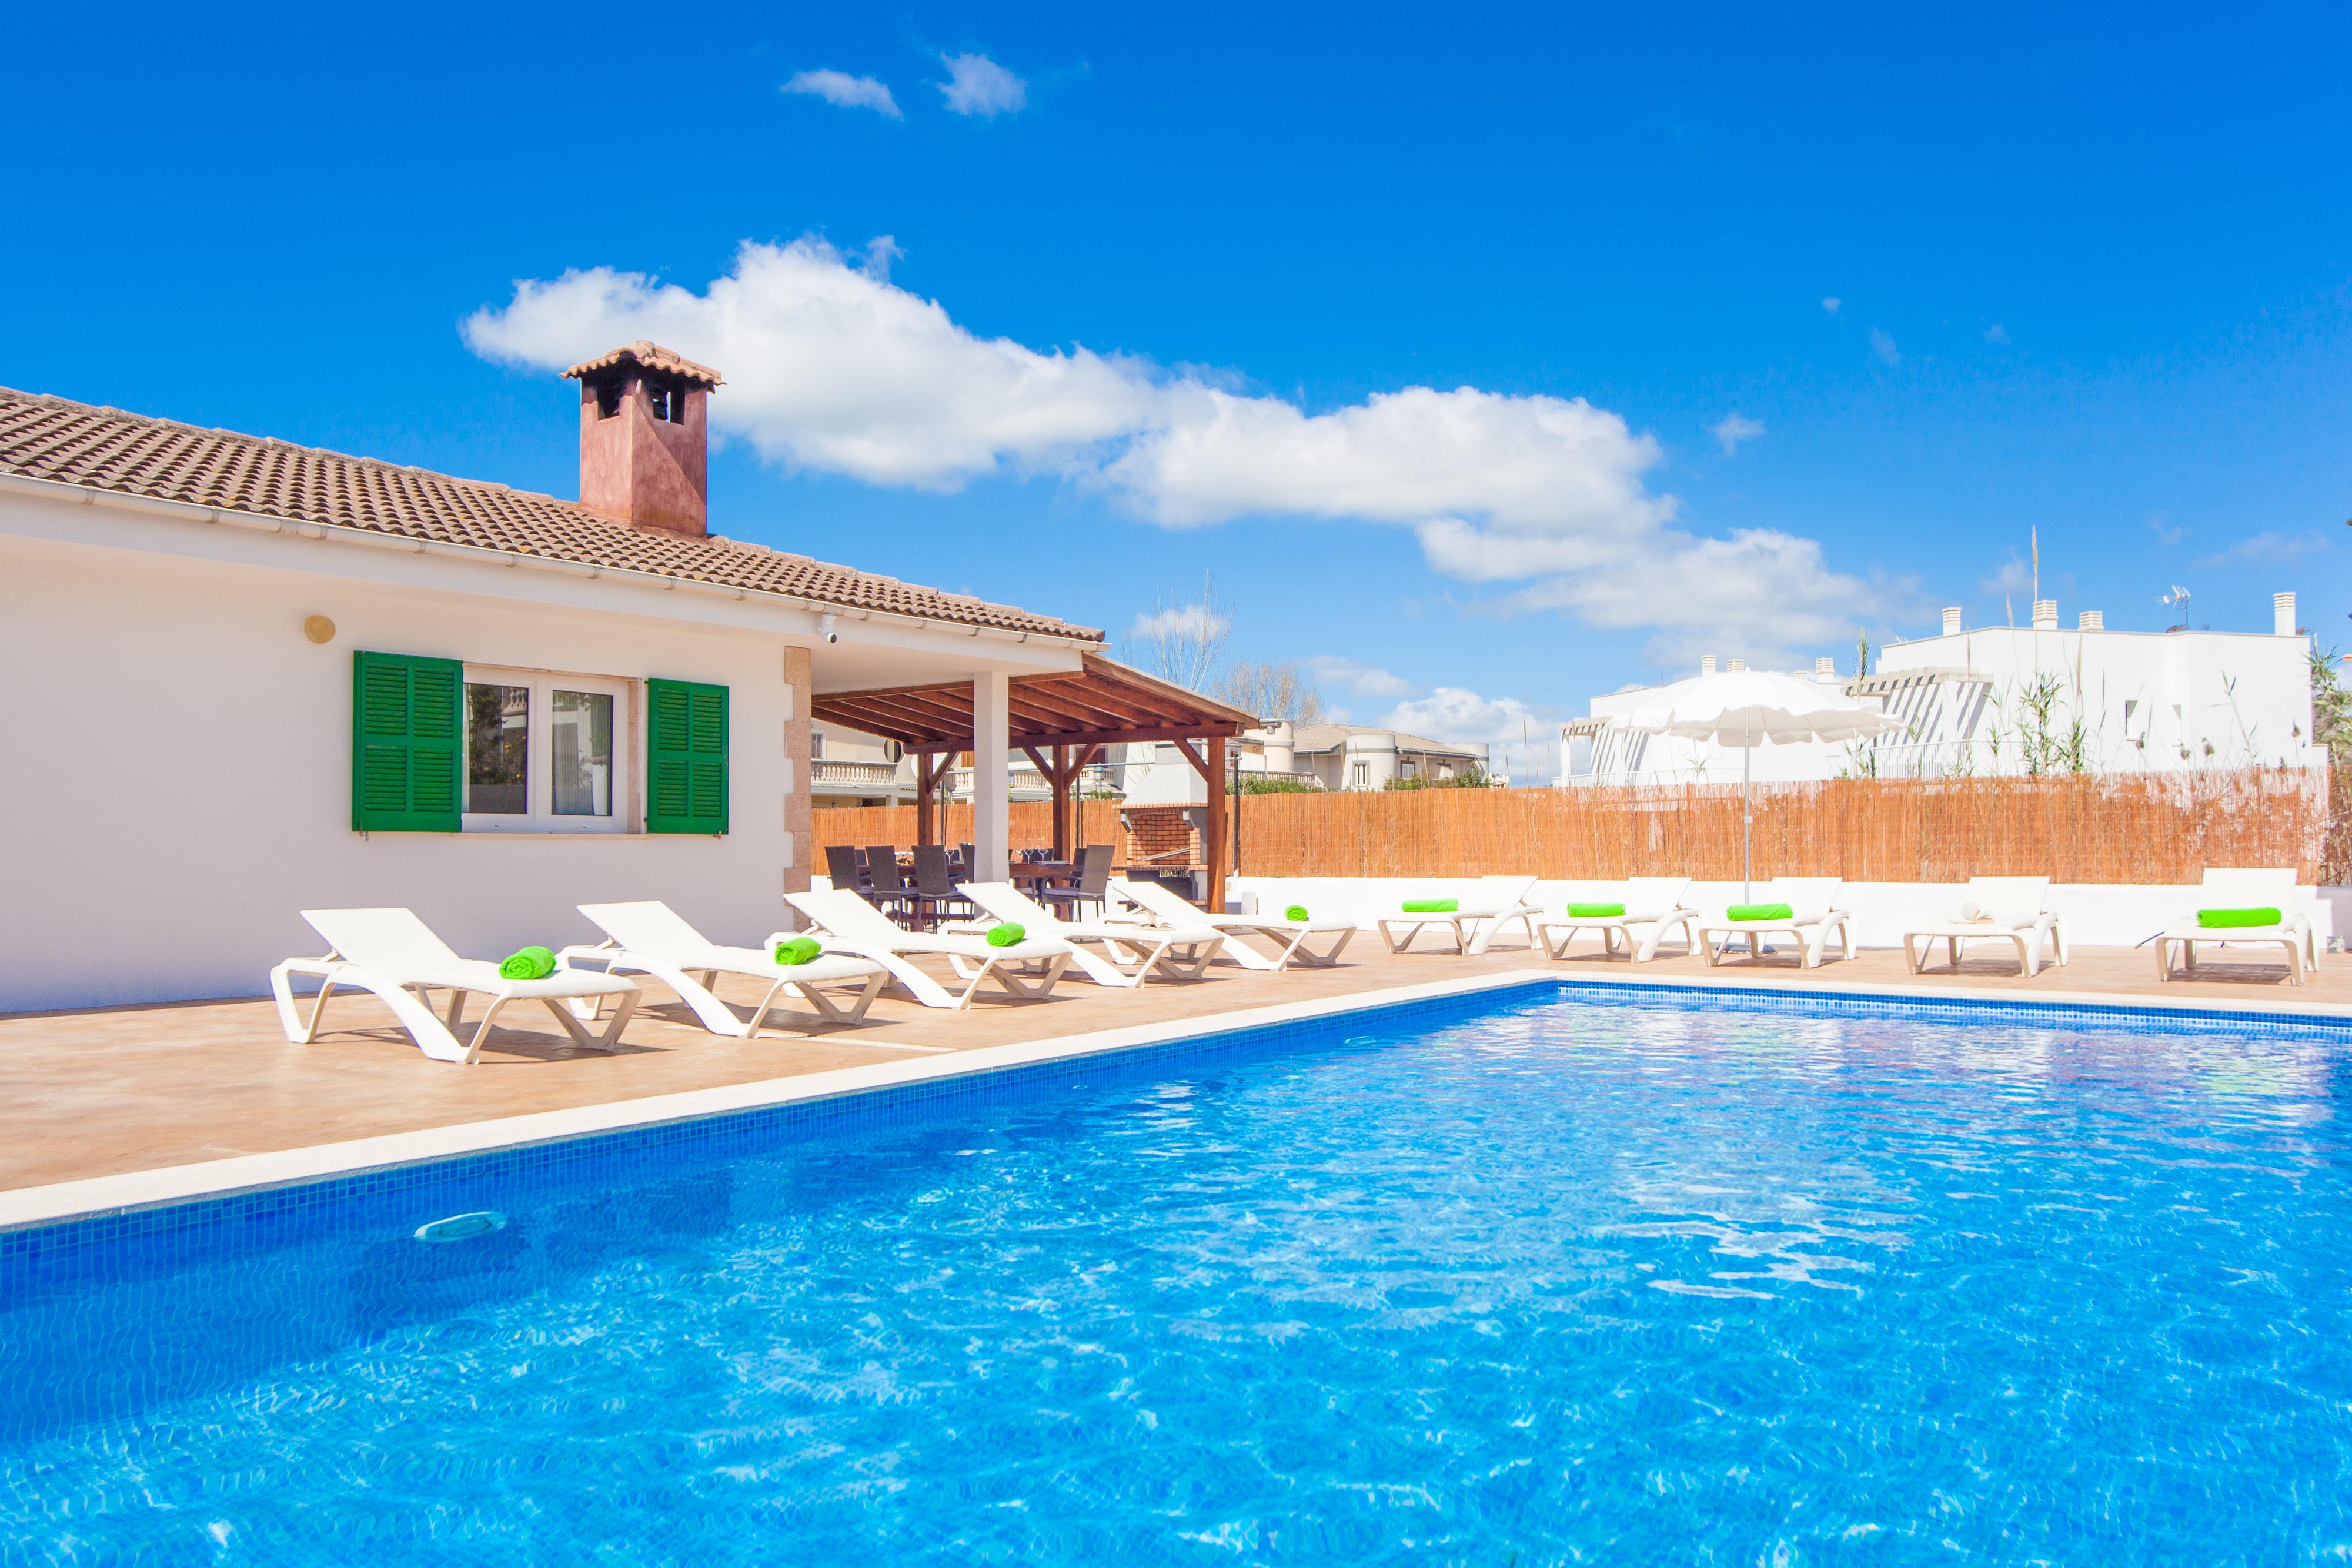 Ferienhaus RODRIGUEZ DE LA FUENTE 19 (SIN NOMBRE) (2144936), Platja de Muro, Mallorca, Balearische Inseln, Spanien, Bild 3